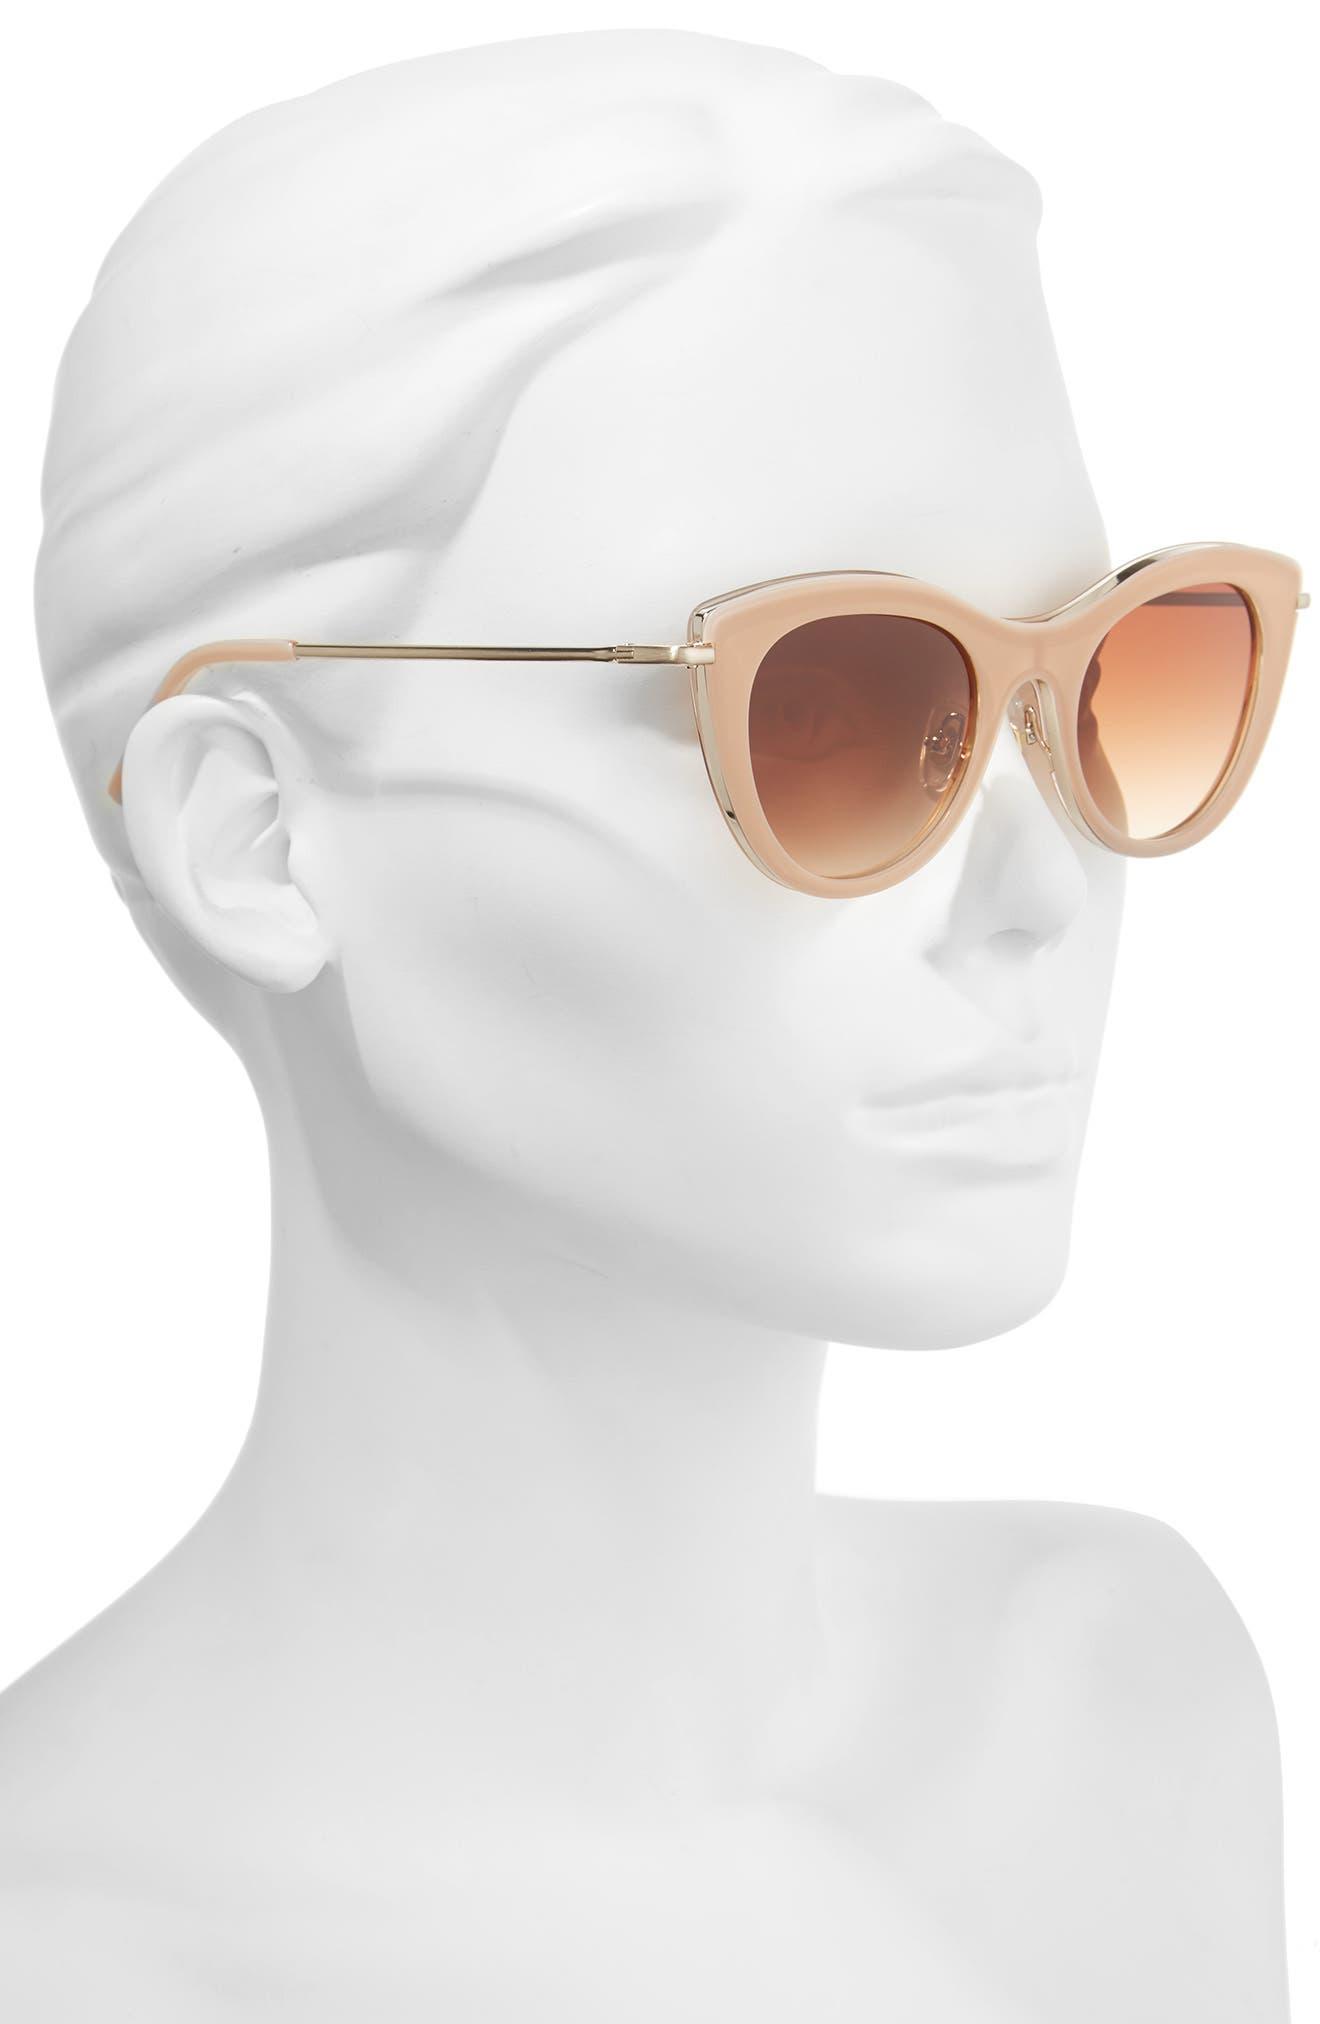 Gansevoort 48mm Special Fit Cat Eye Sunglasses,                             Alternate thumbnail 3, color,                             Blush